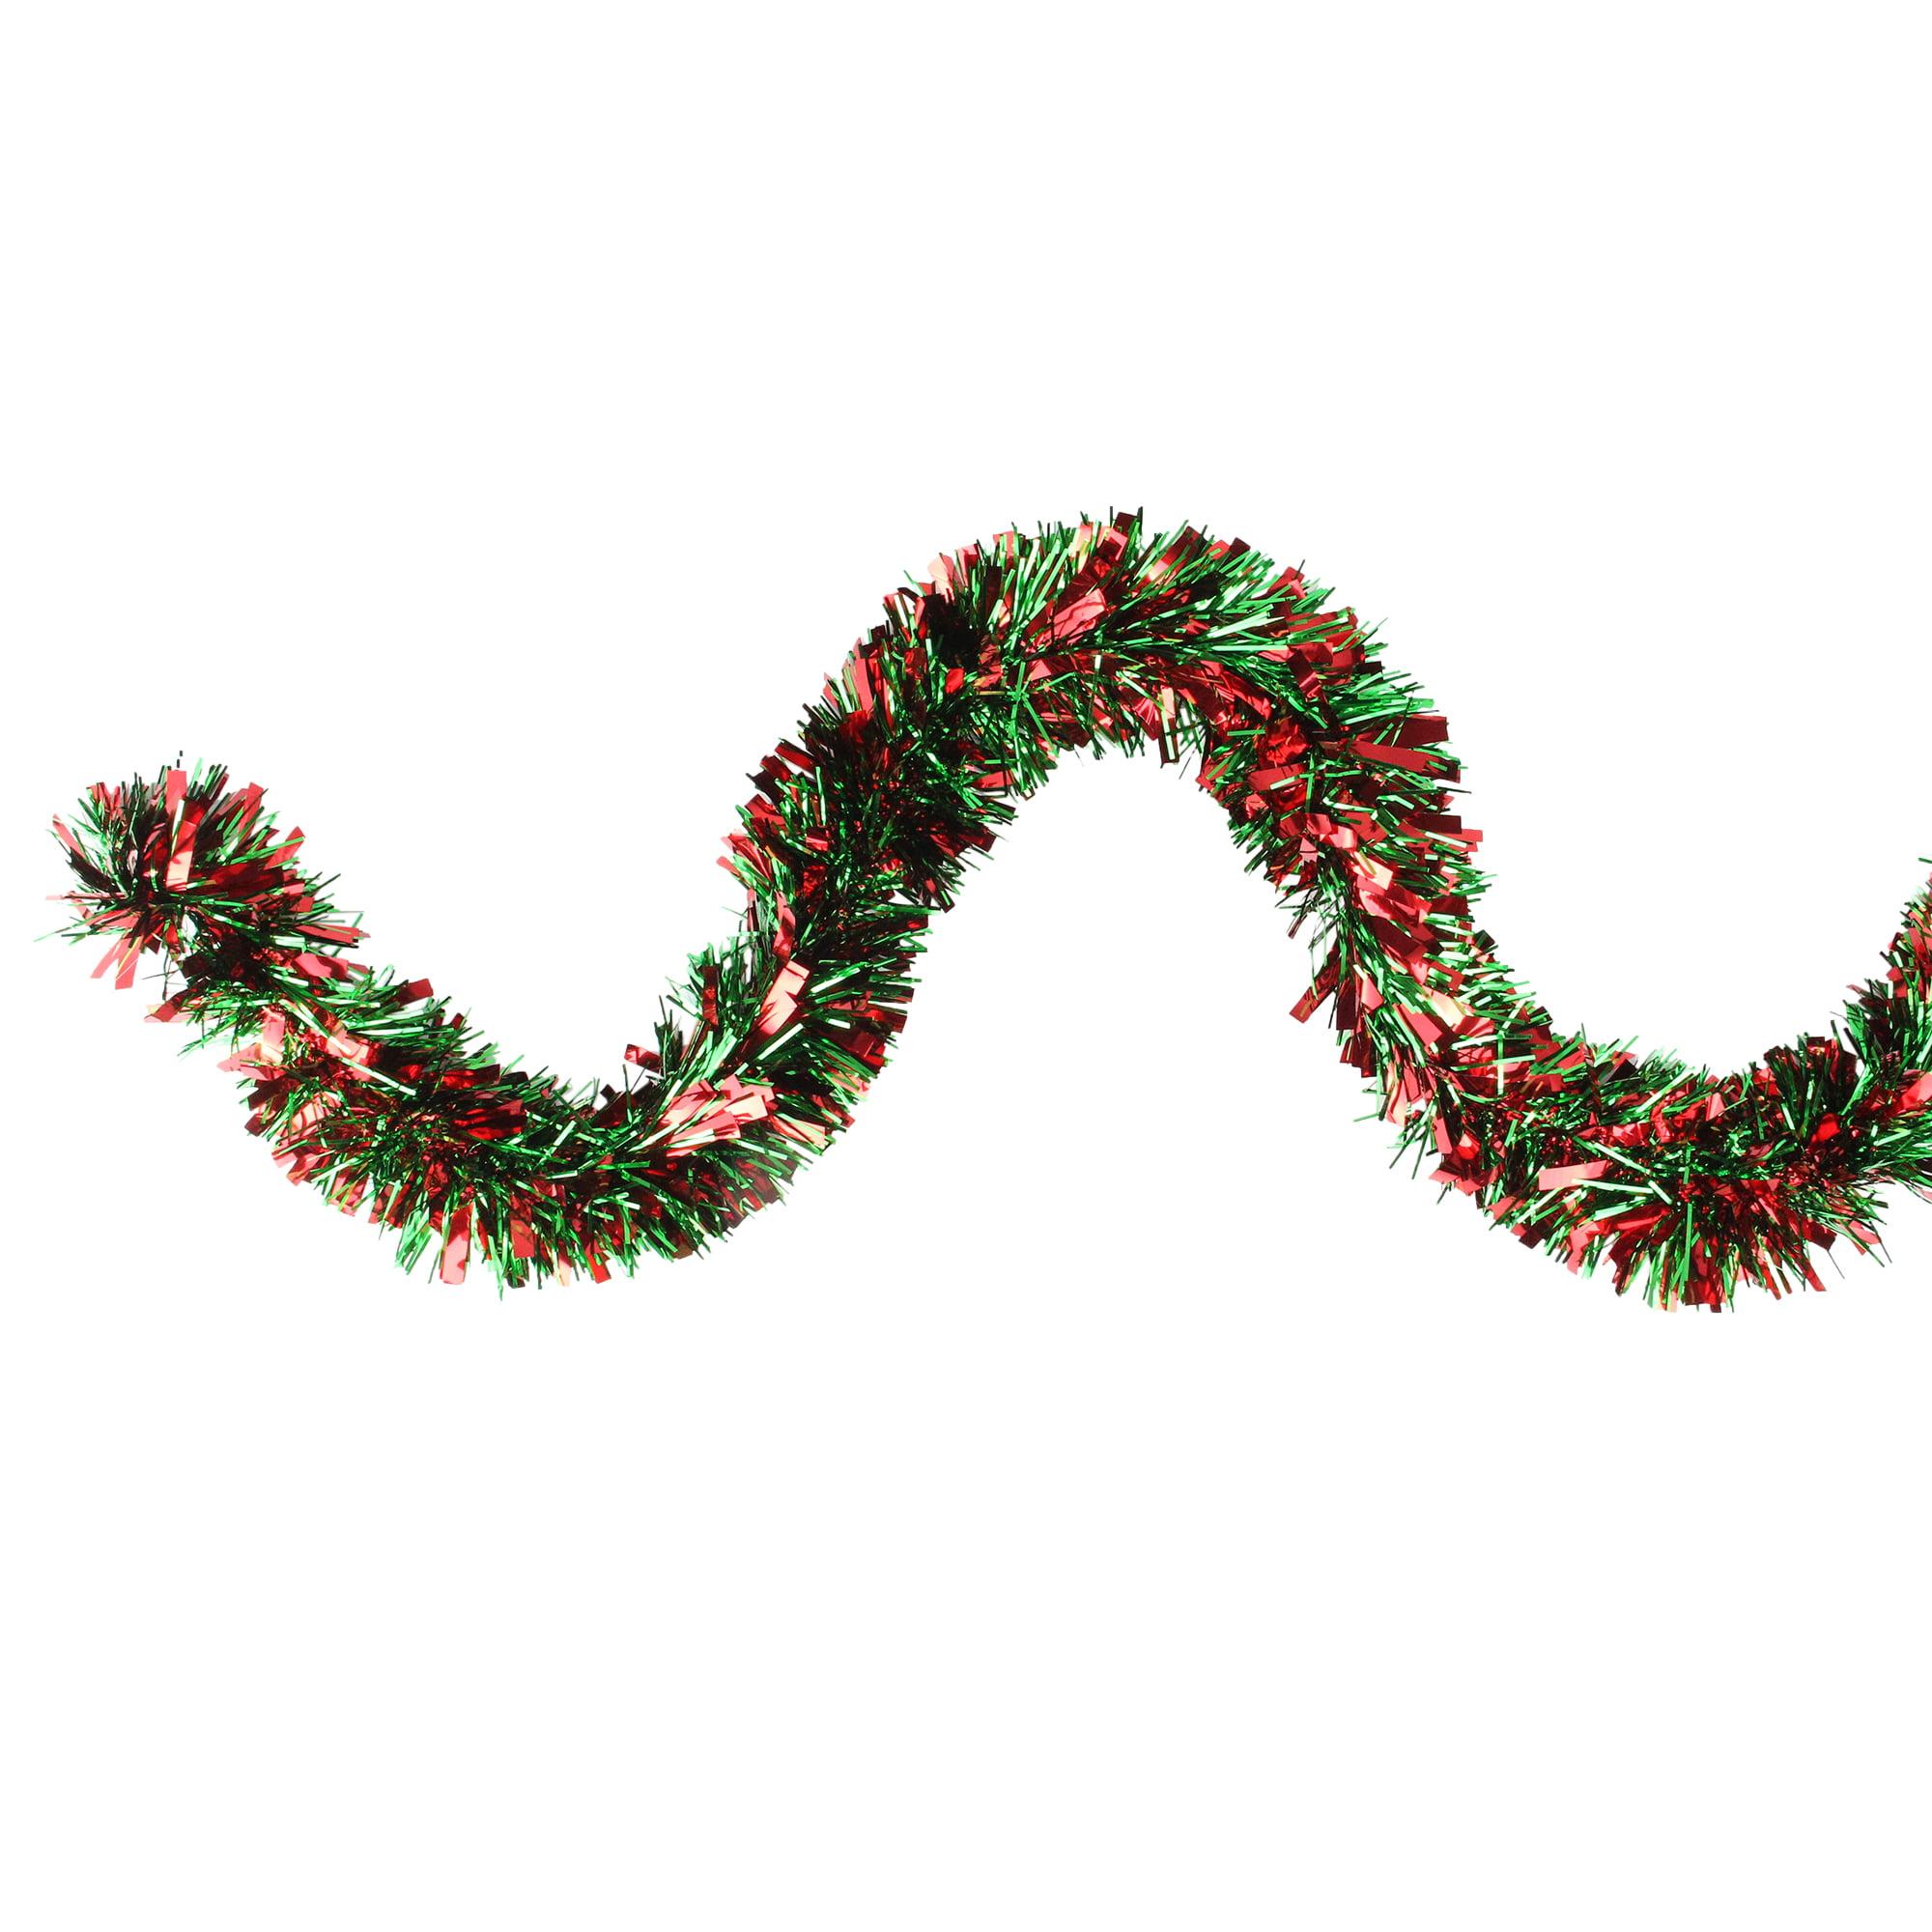 Garland clipart transparent background christmas, Garland transparent background christmas